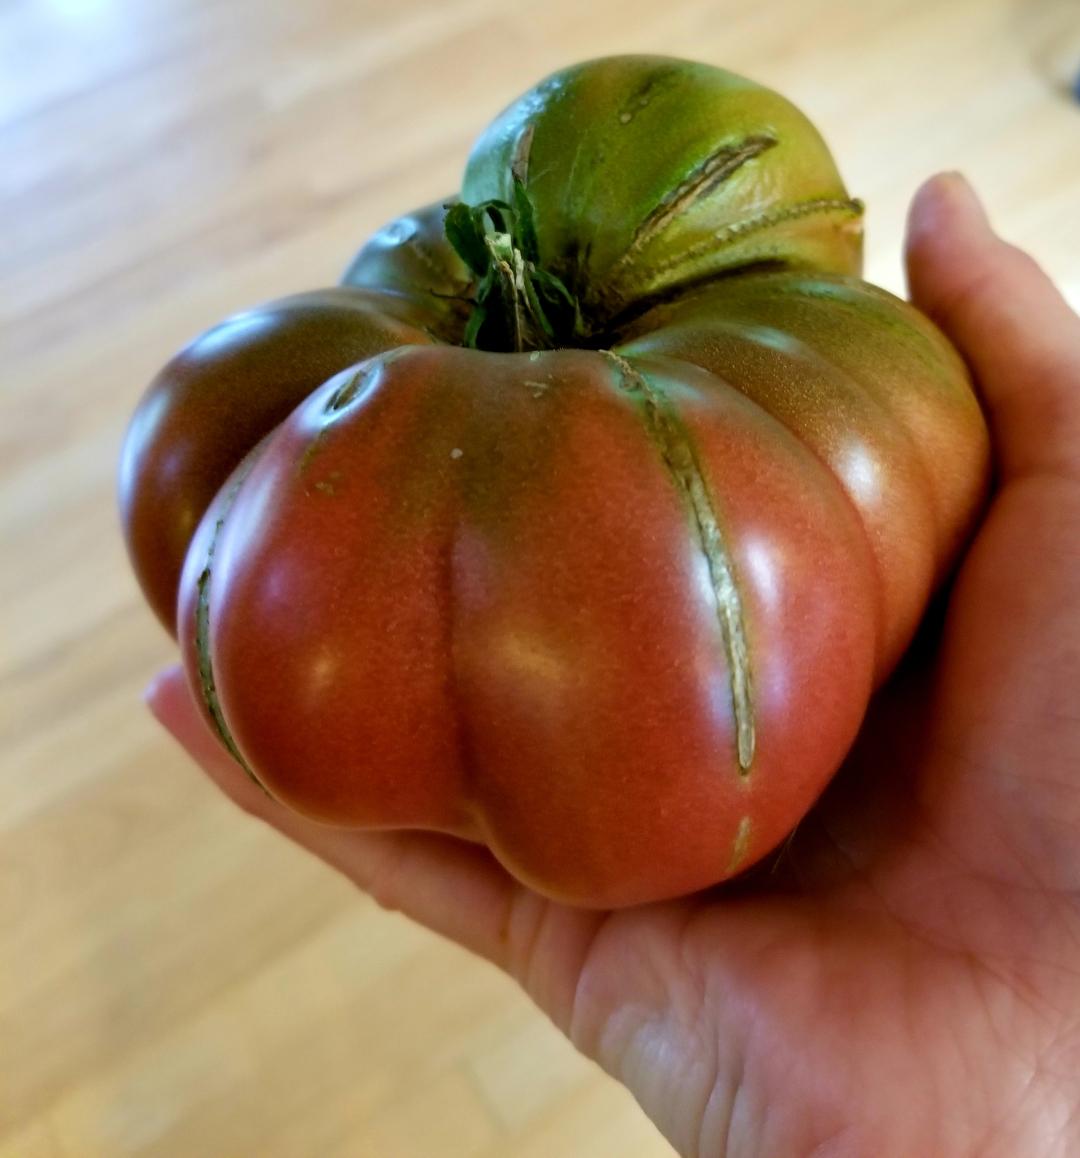 'Black' tomato